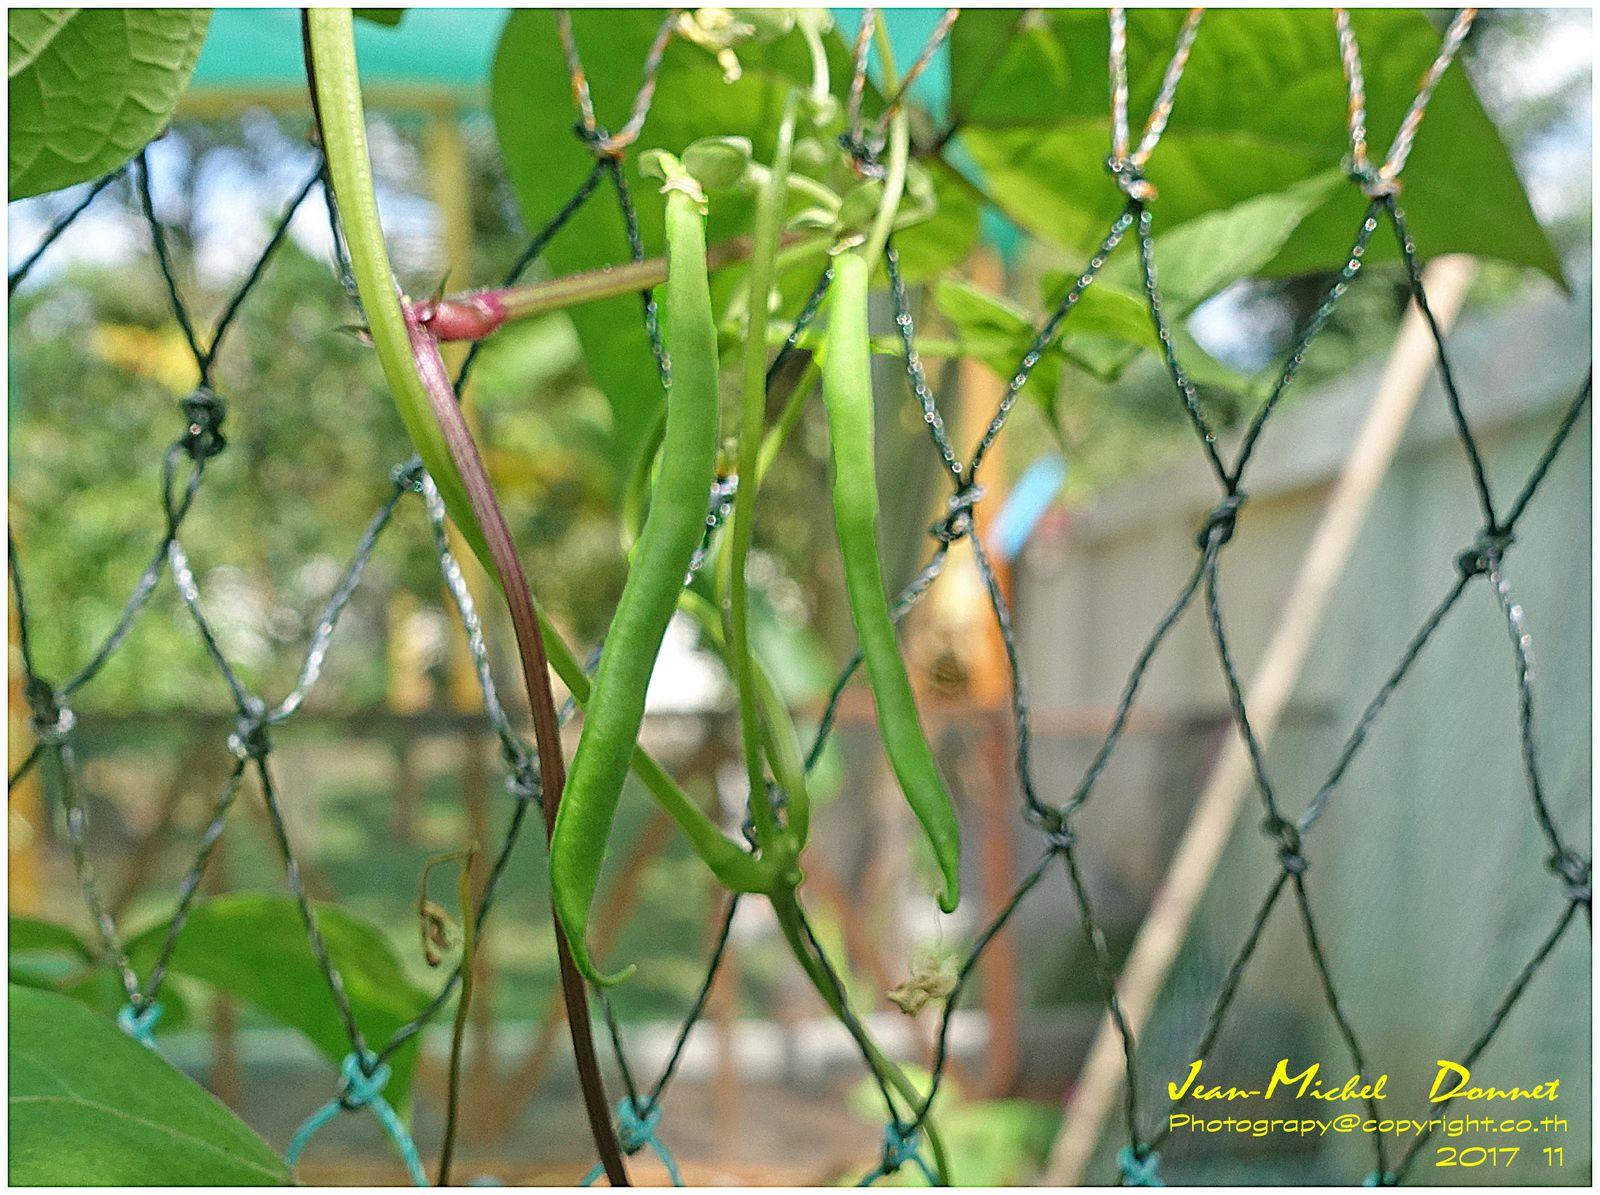 Le jardin en décembre (Thaïlande, Ubonrat)